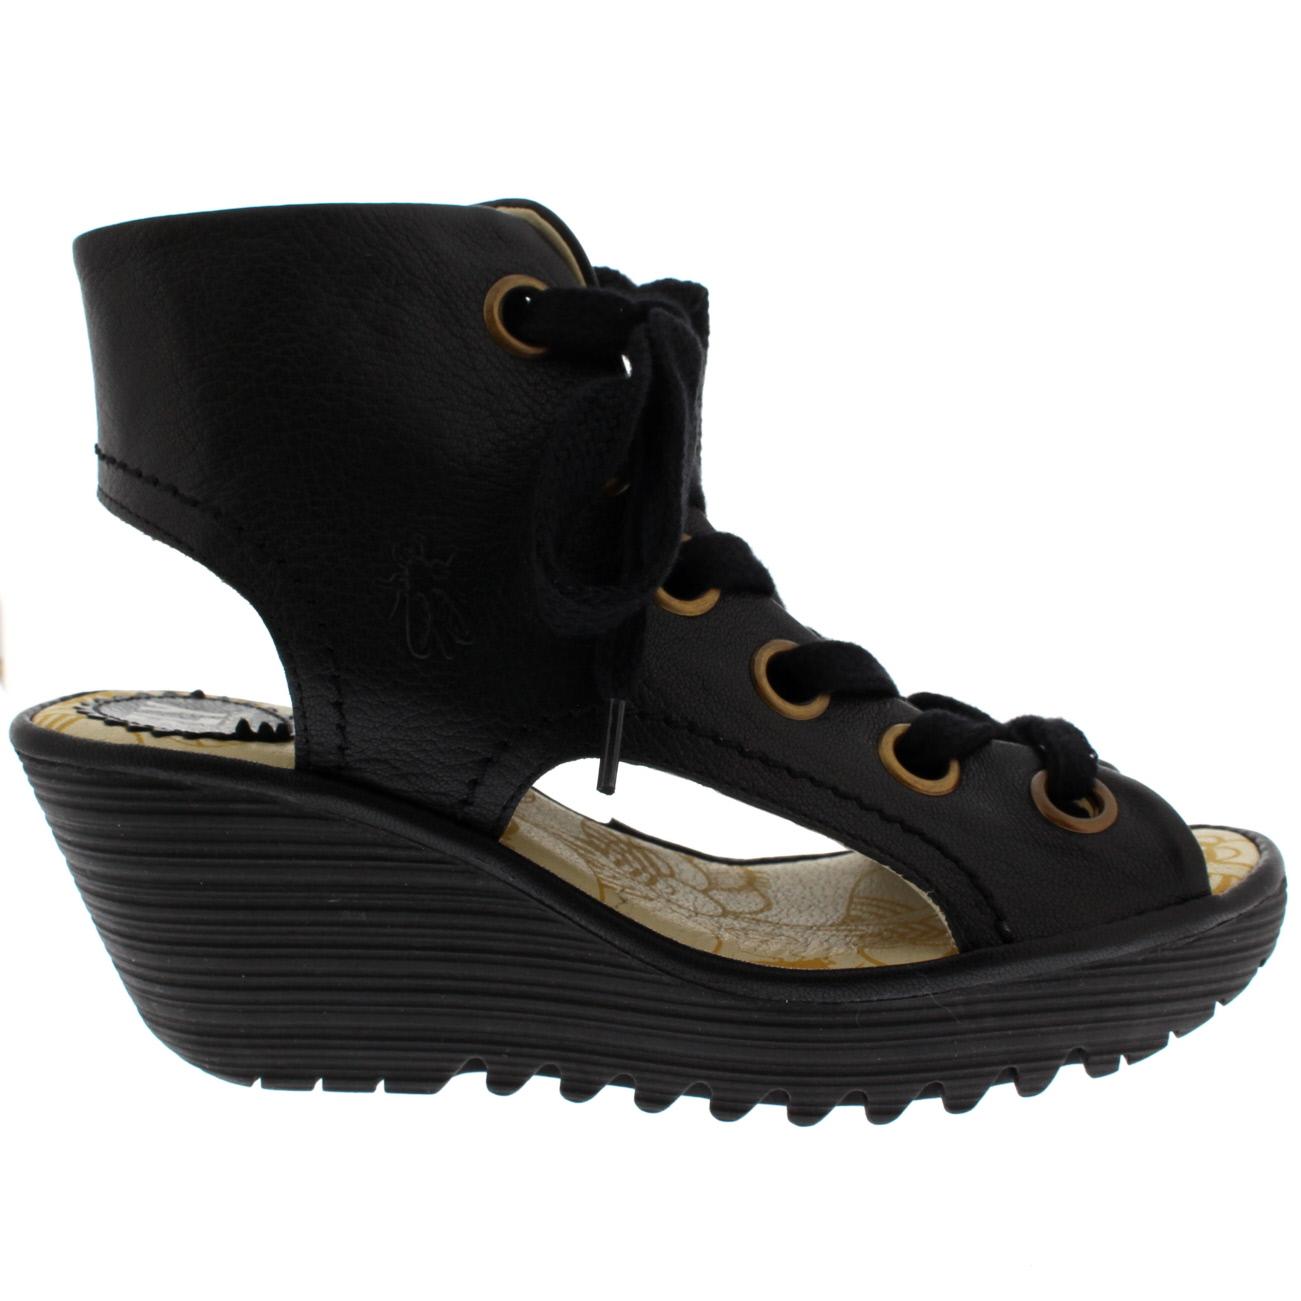 Ladies Fly Peep London Yaba Mousse Leather Peep Fly Toe Holiday zapato Wedge Heel All Talla 468990